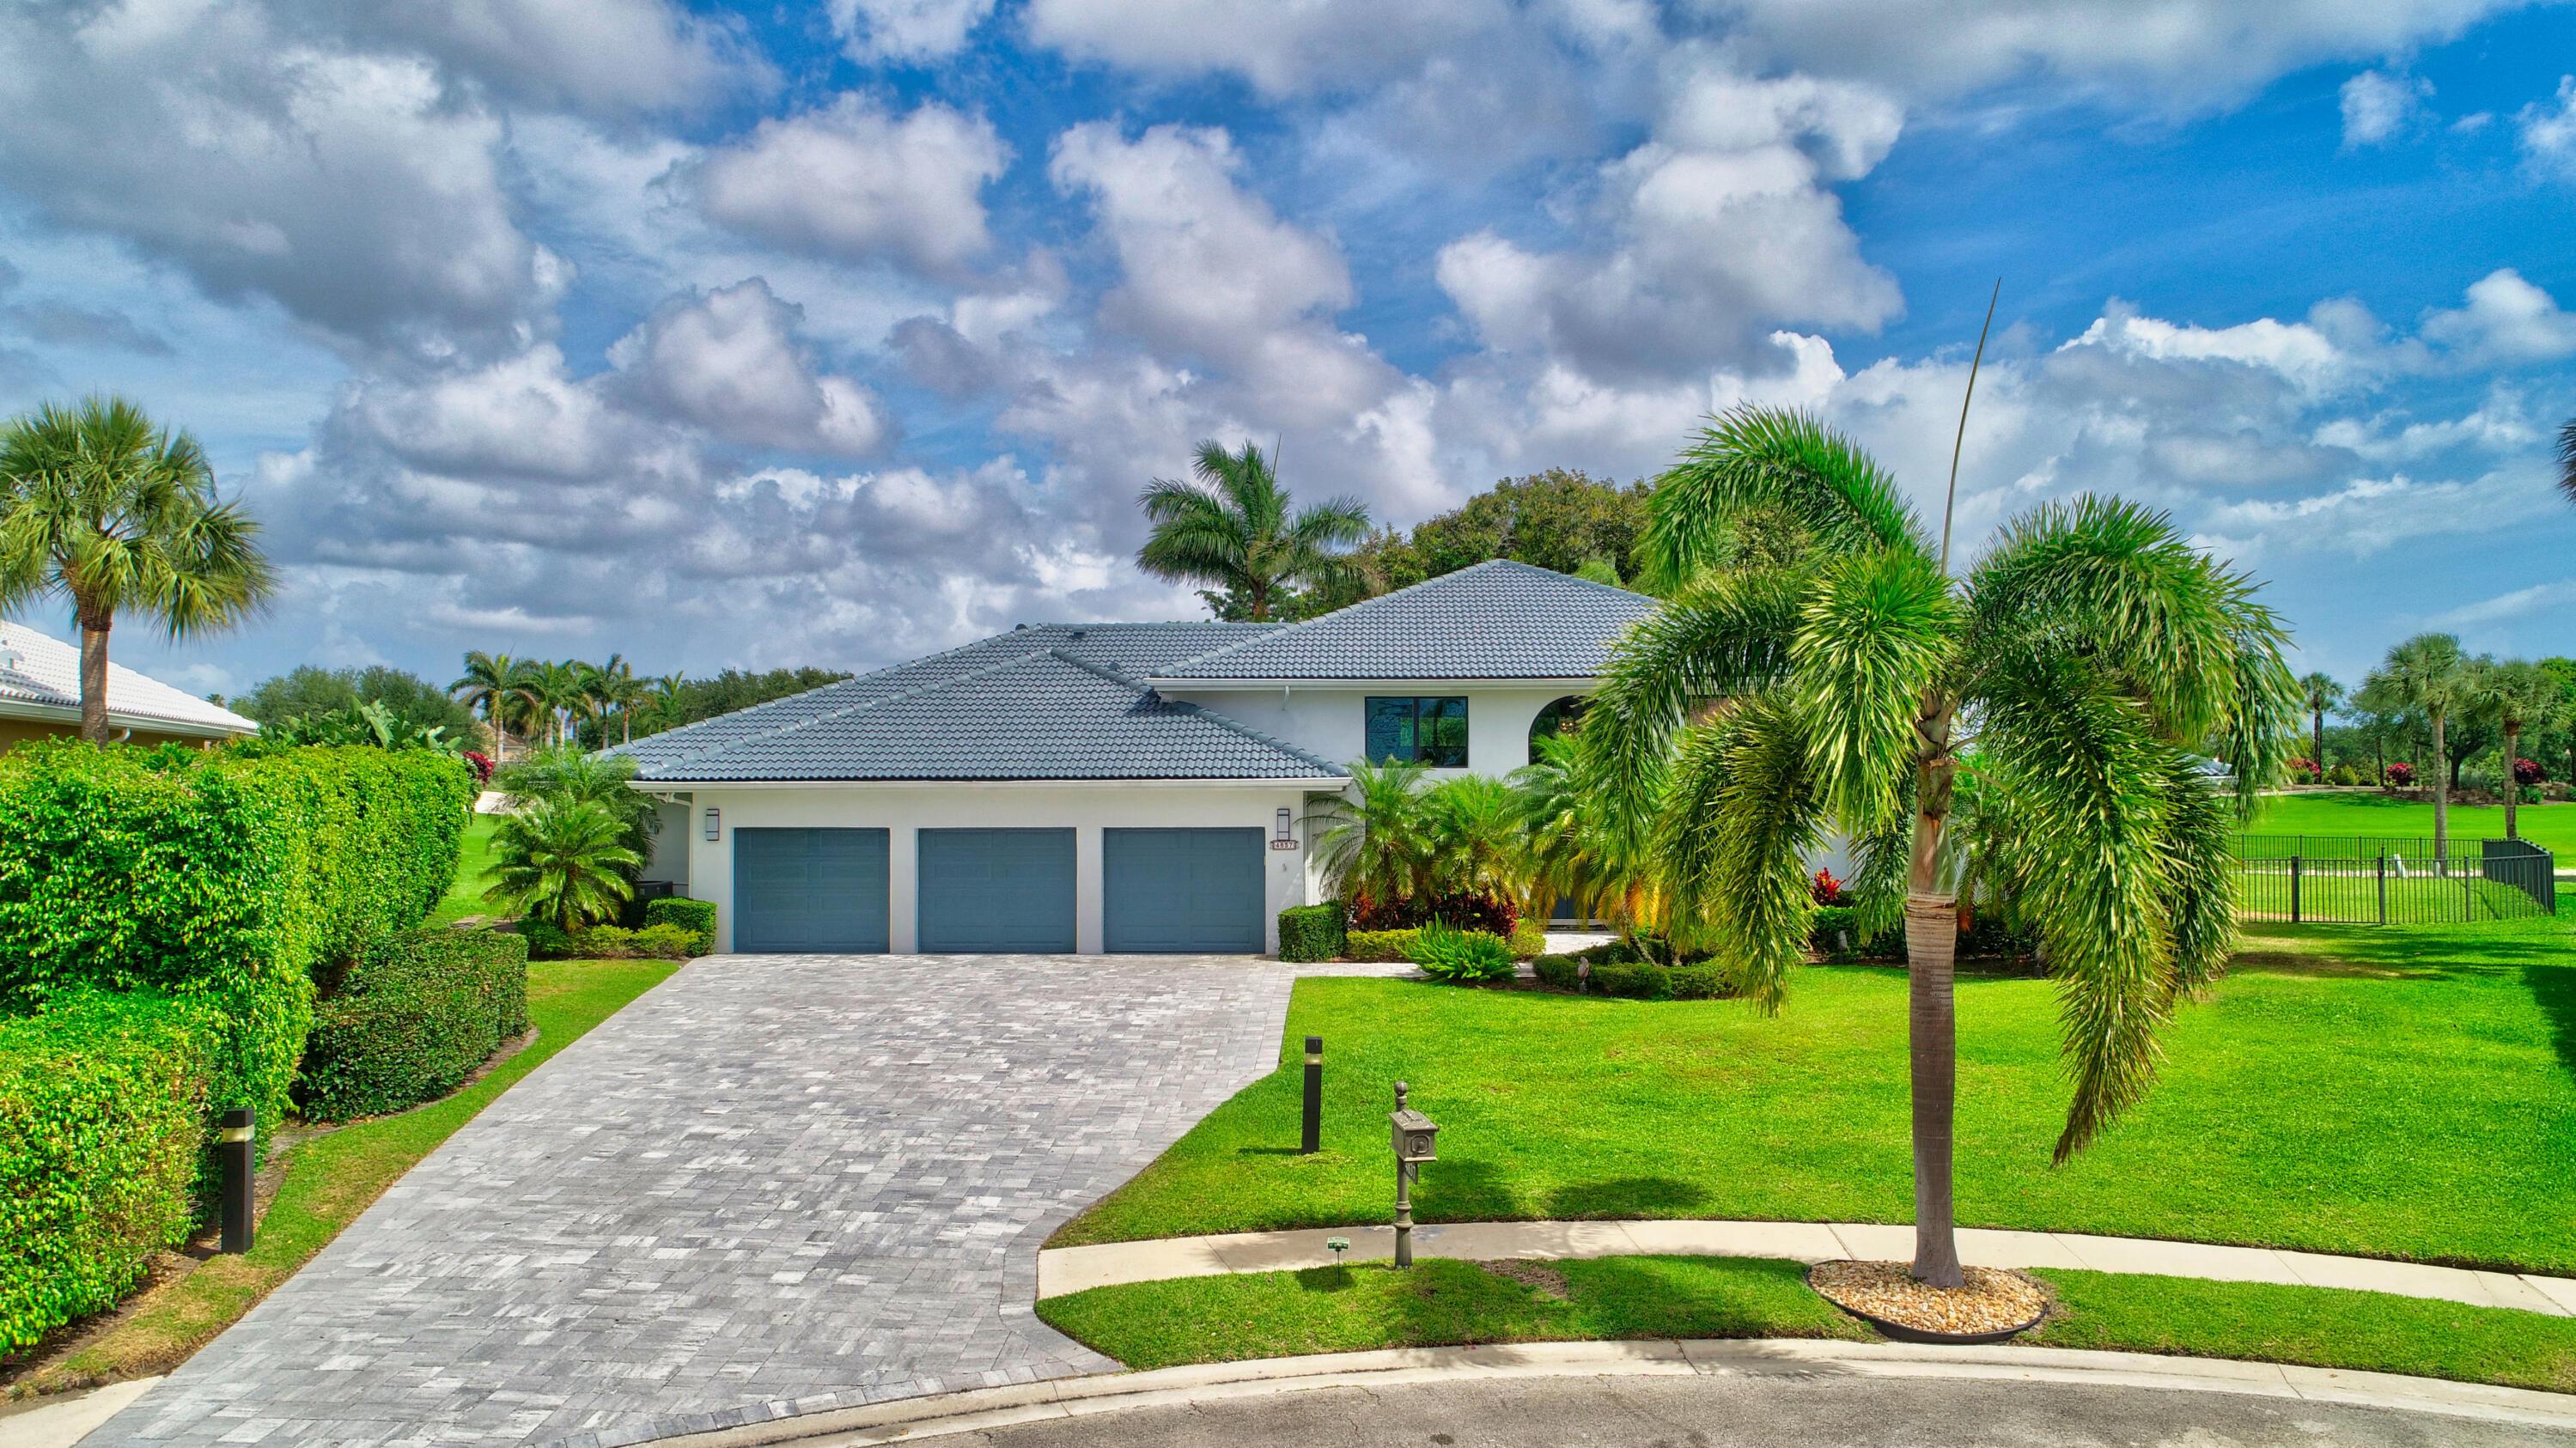 4837 Tallowwood Lane Boca Raton, FL 33487